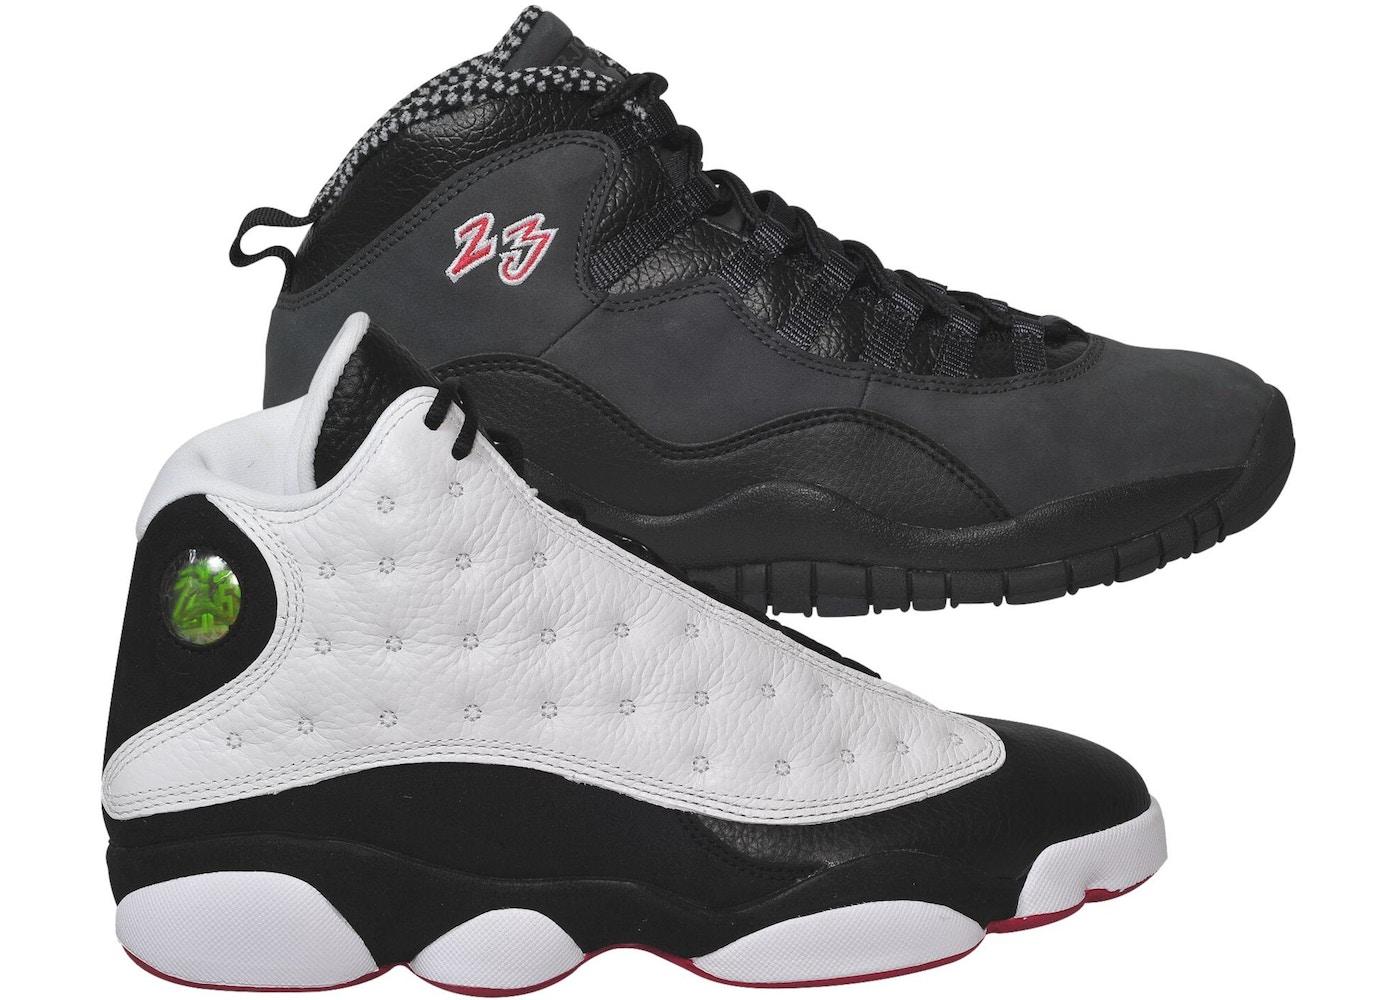 finest selection 59ed1 ebe1b Buy Air Jordan Packs Shoes   Deadstock Sneakers